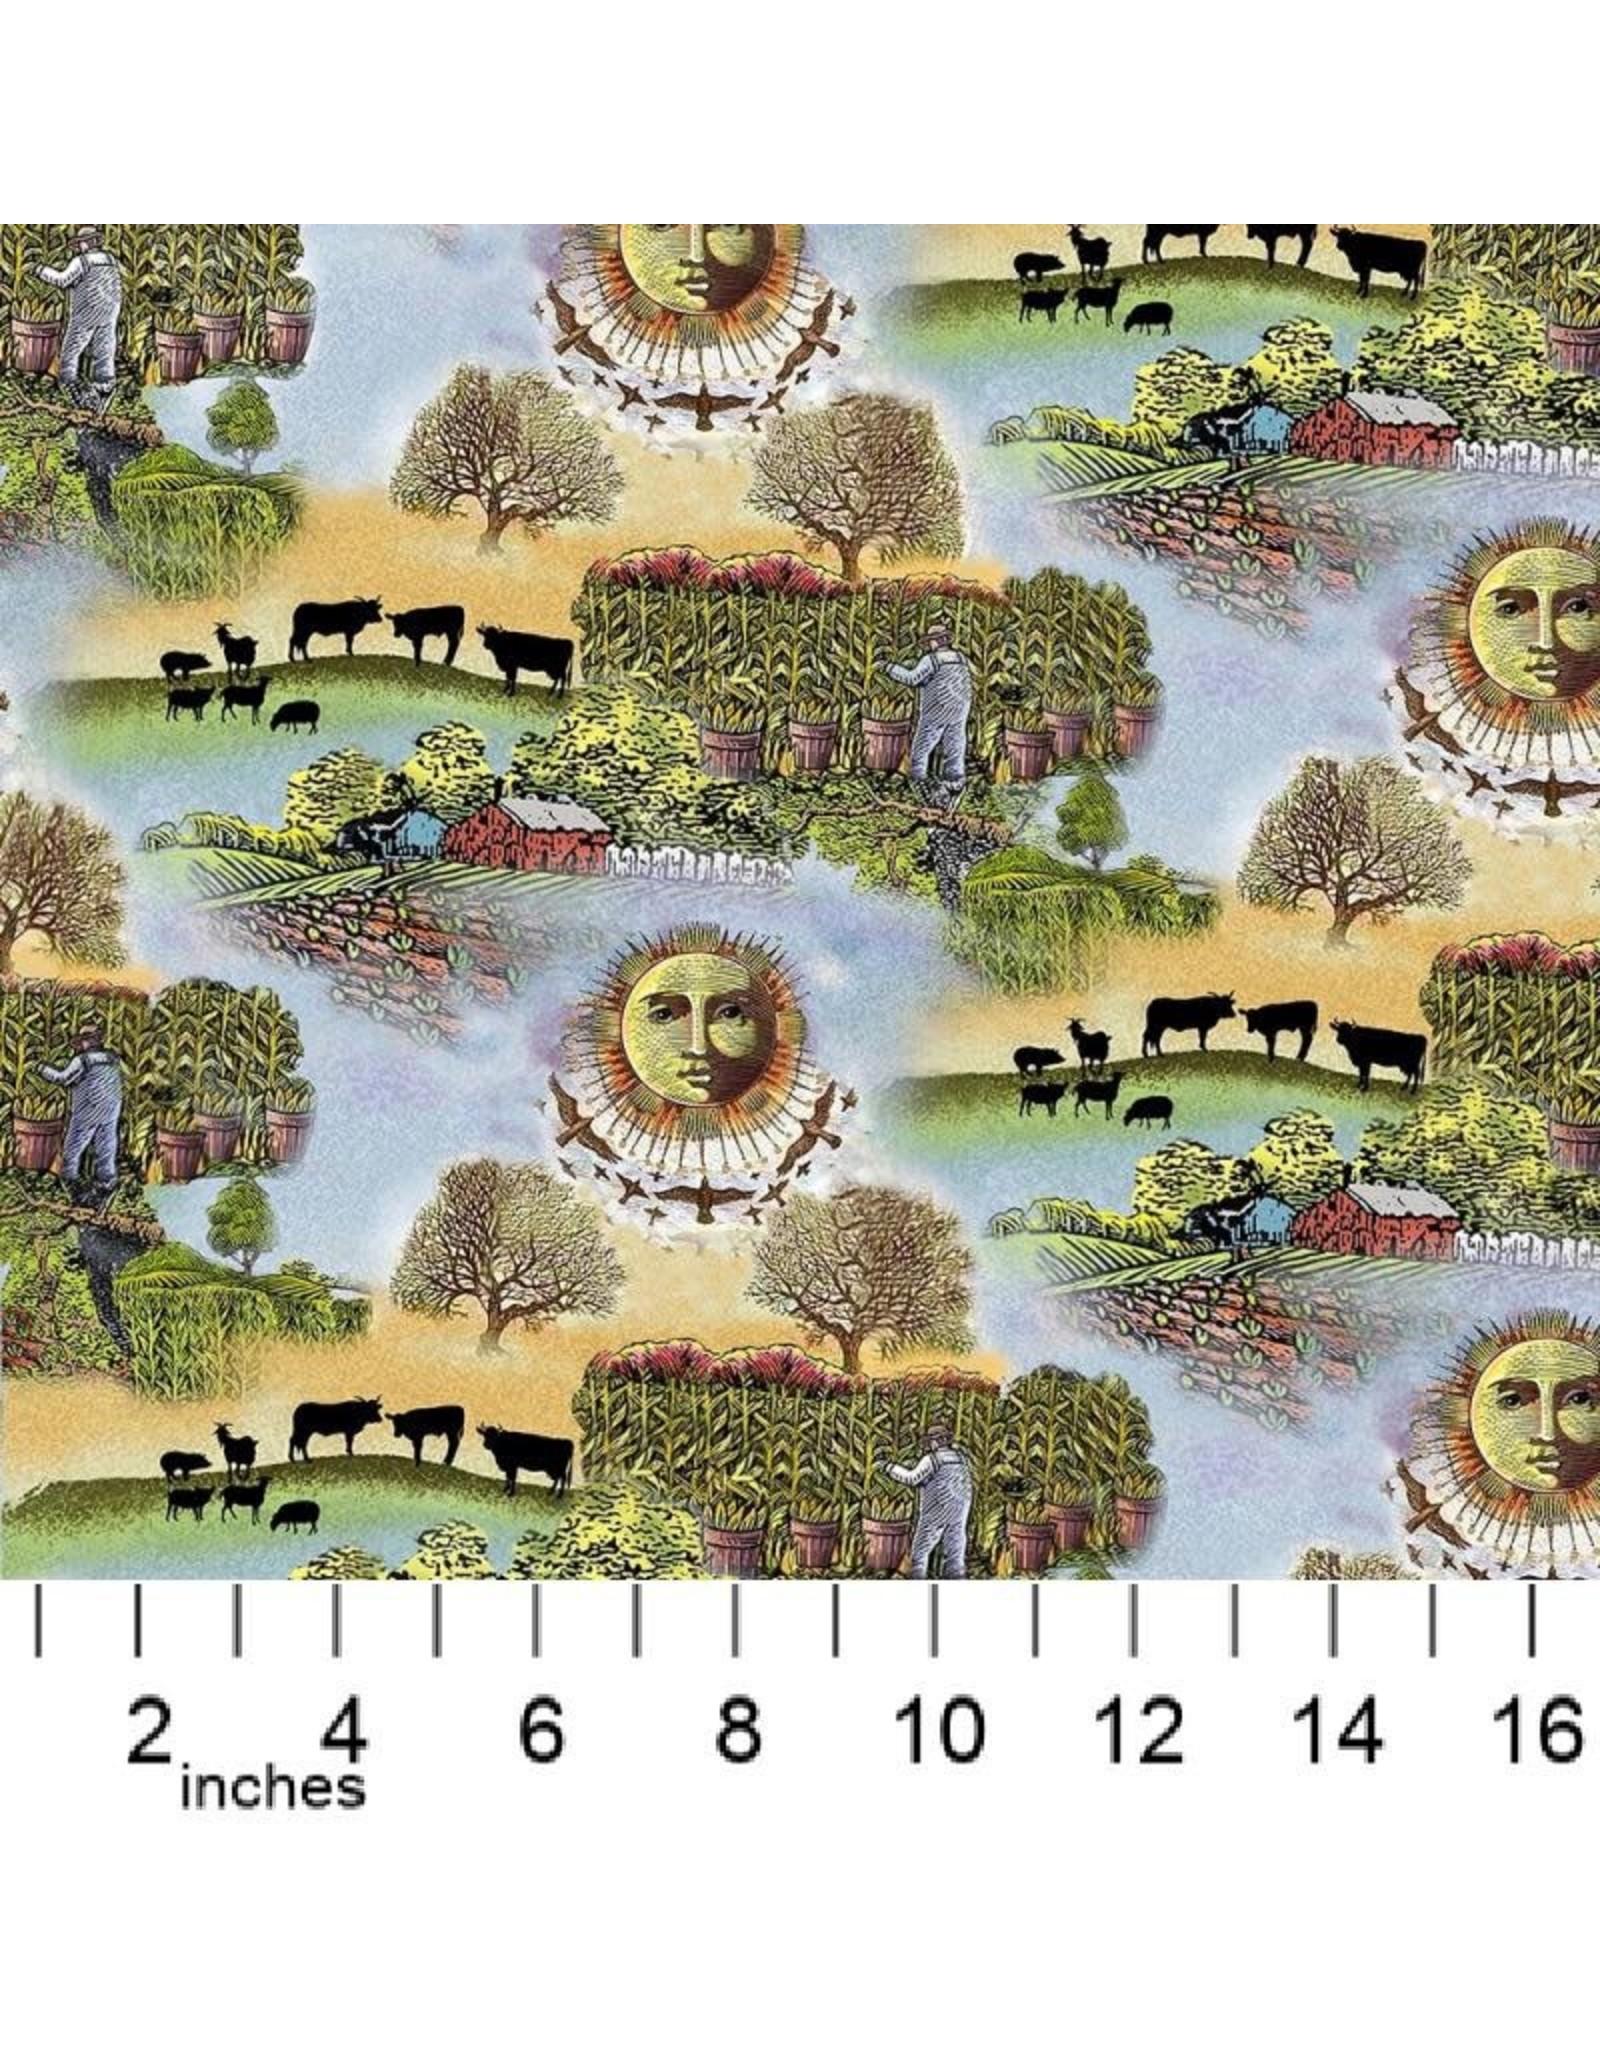 PD's Sykel Fabrics Collection Old Farmers Almanac, Celestial Scenic, Dinner Napkin